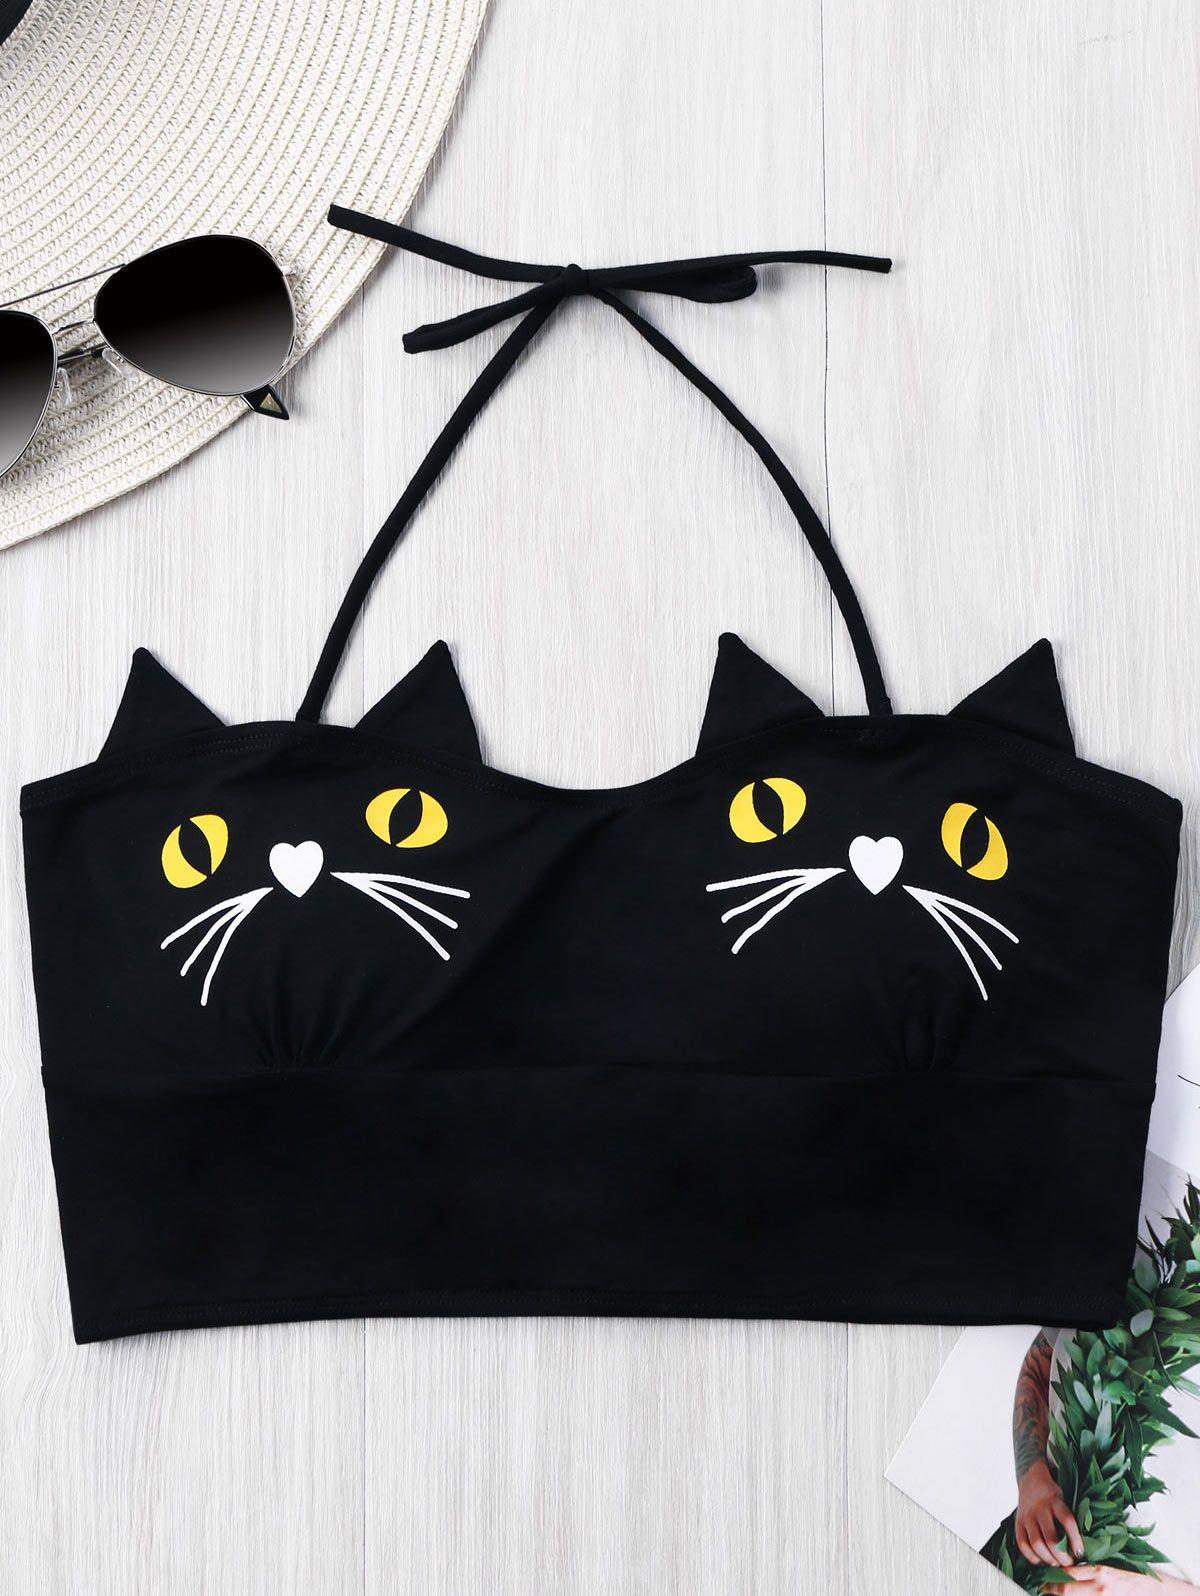 Black Kitten Spaghetti Strap Harajuku Crop Top On Storenvy In 2020 Girls Crop Tops Black Kitten Halter Crop Top